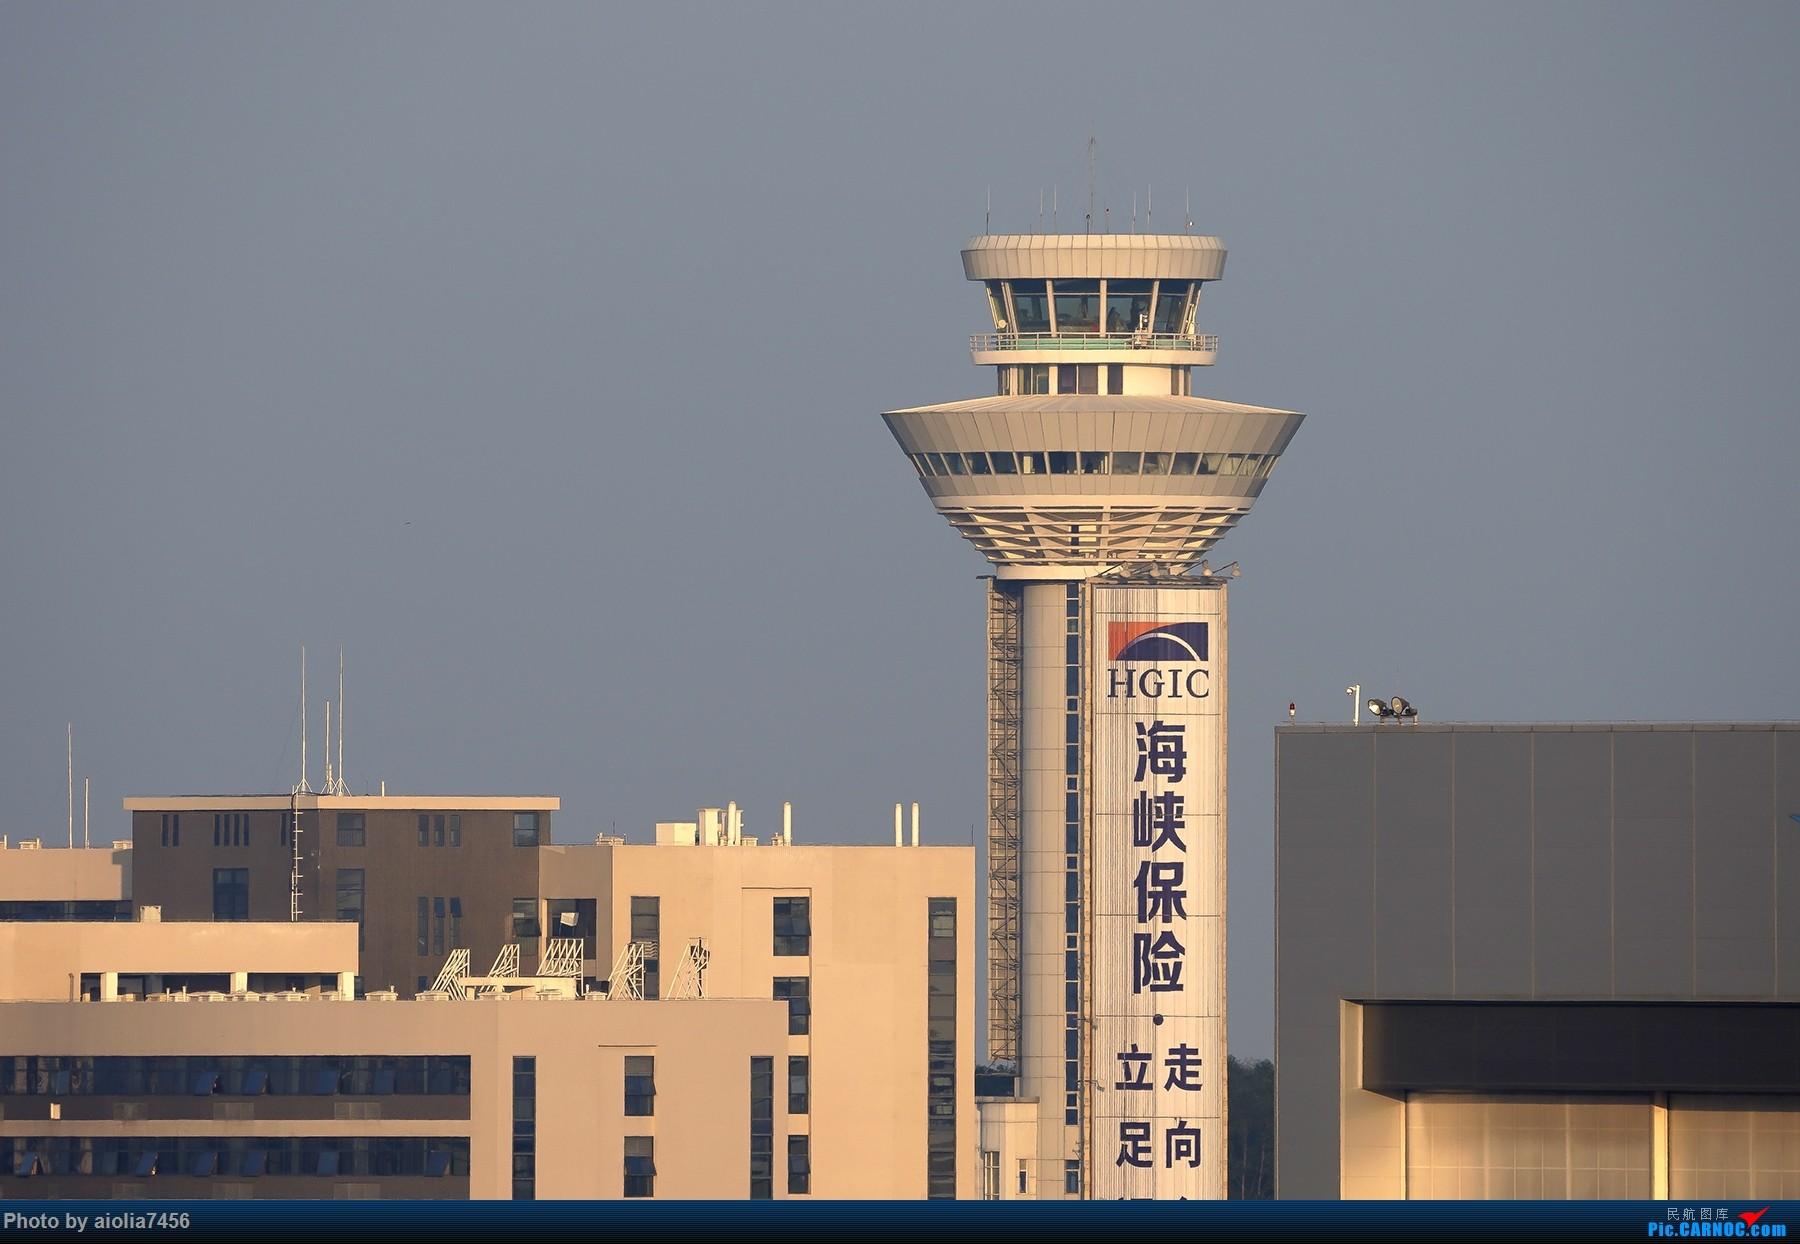 Re:[原创]【福州飞友会】【合肥飞友会】最最难忘的FOC的那一抹蓝    中国福州长乐国际机场